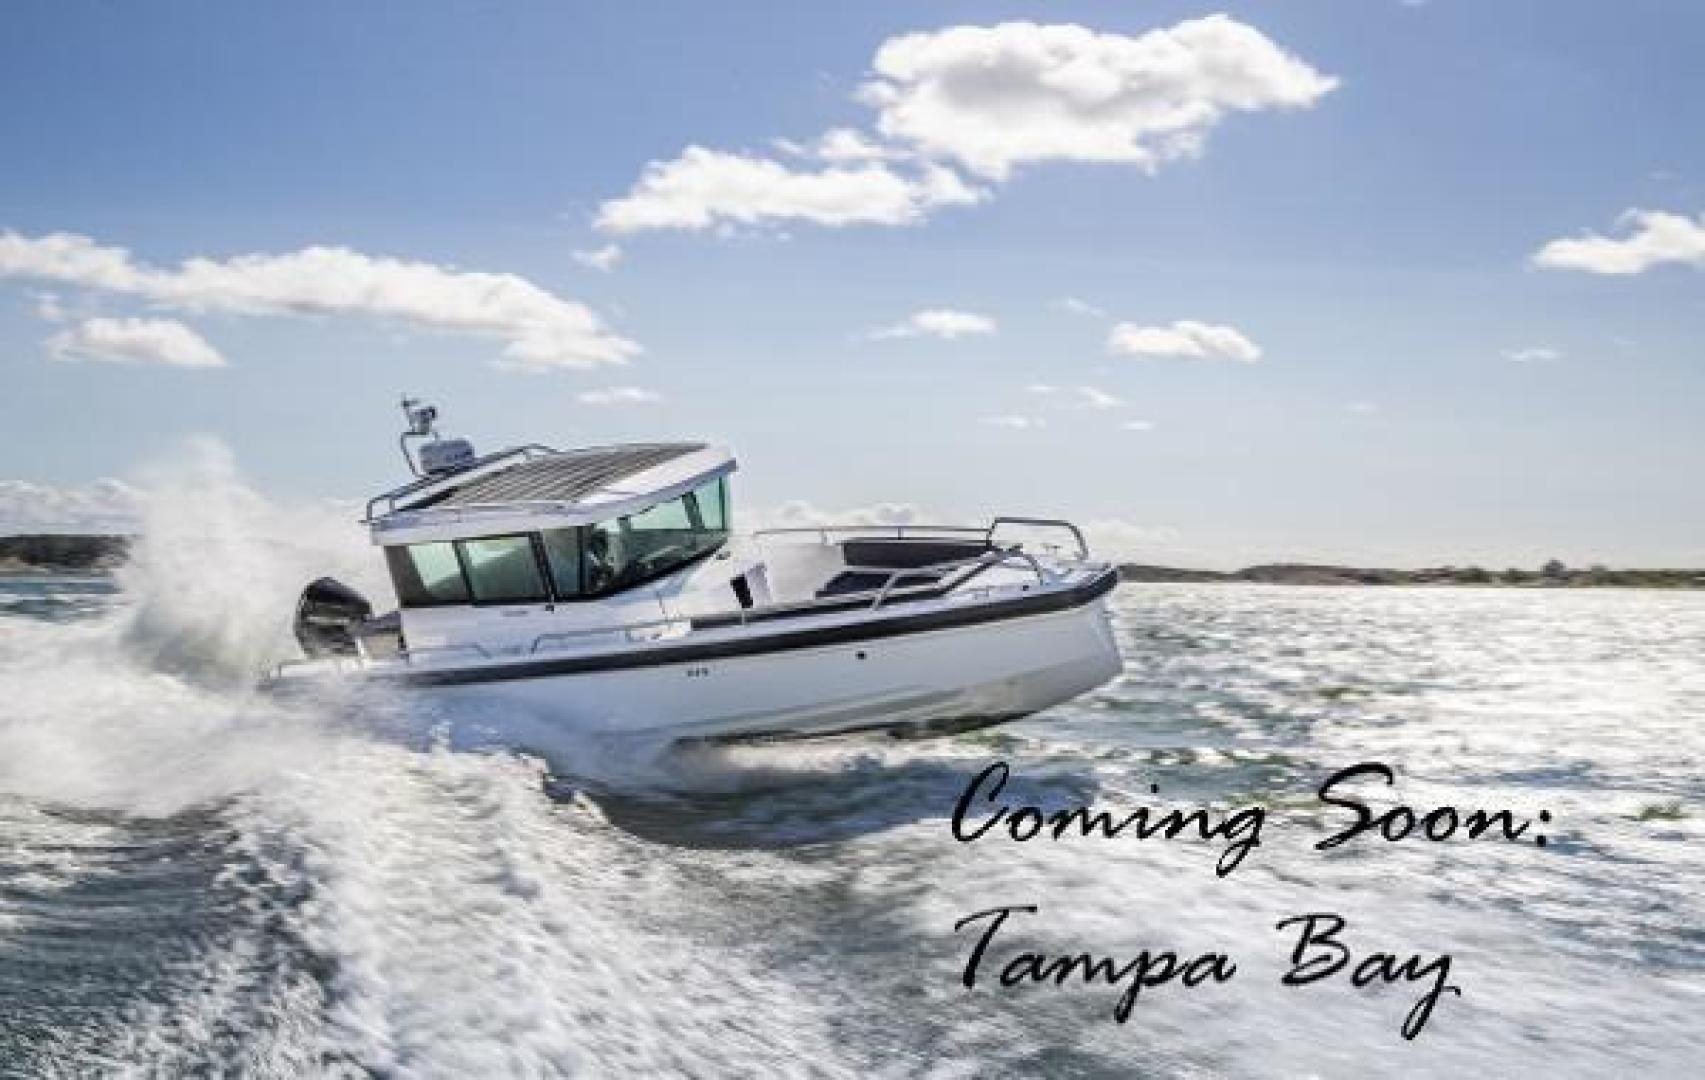 Axopar-28 CABIN 2021-Axopar 28 CABIN Tampa Bay-Florida-United States-1531496 | Thumbnail